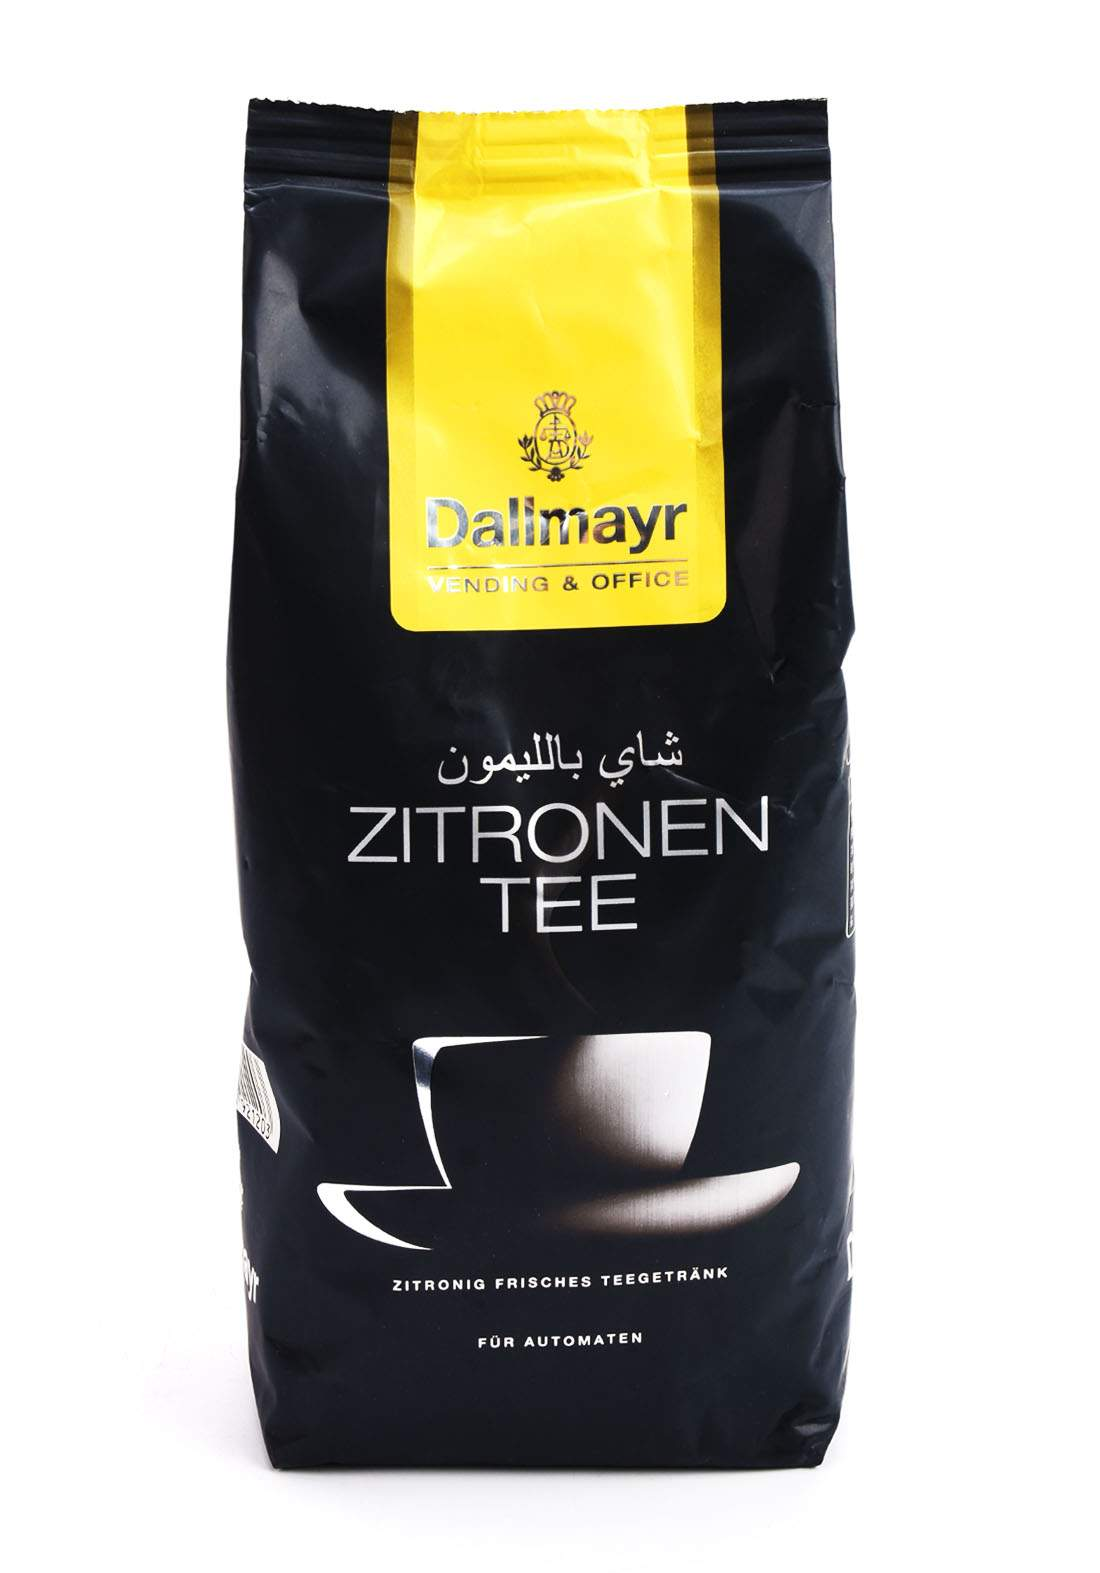 Dallmayr Vending & Office Zitronen Tee 1kg شاي بالليمون